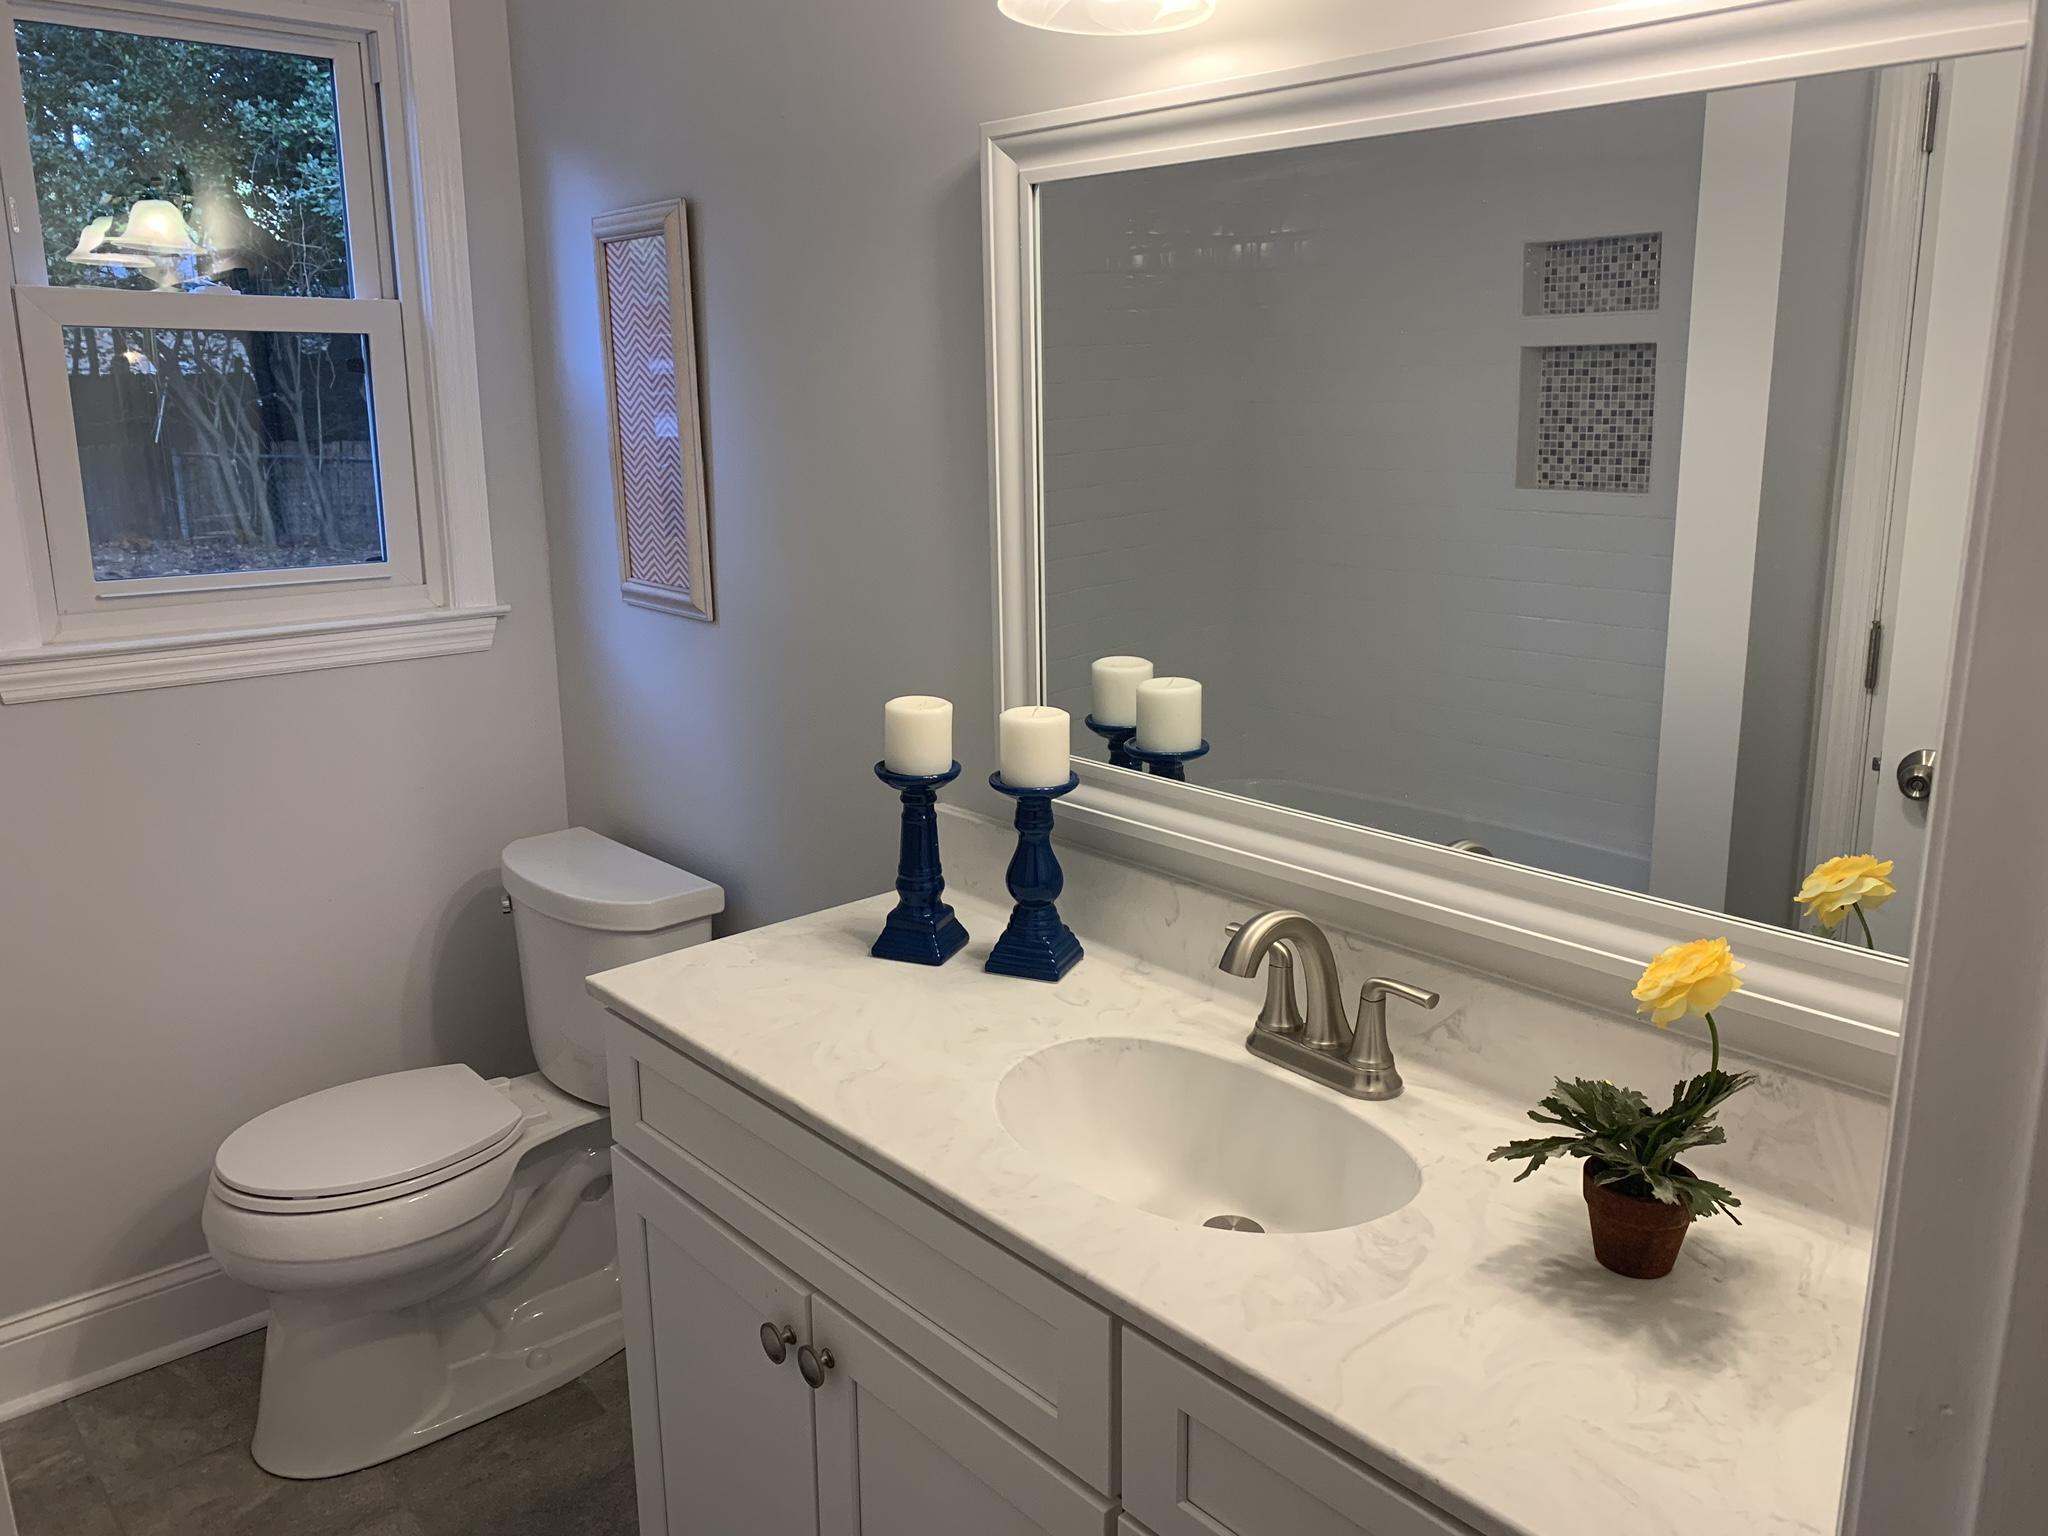 Heathwood Ext Homes For Sale - 2 Blaine, Charleston, SC - 7